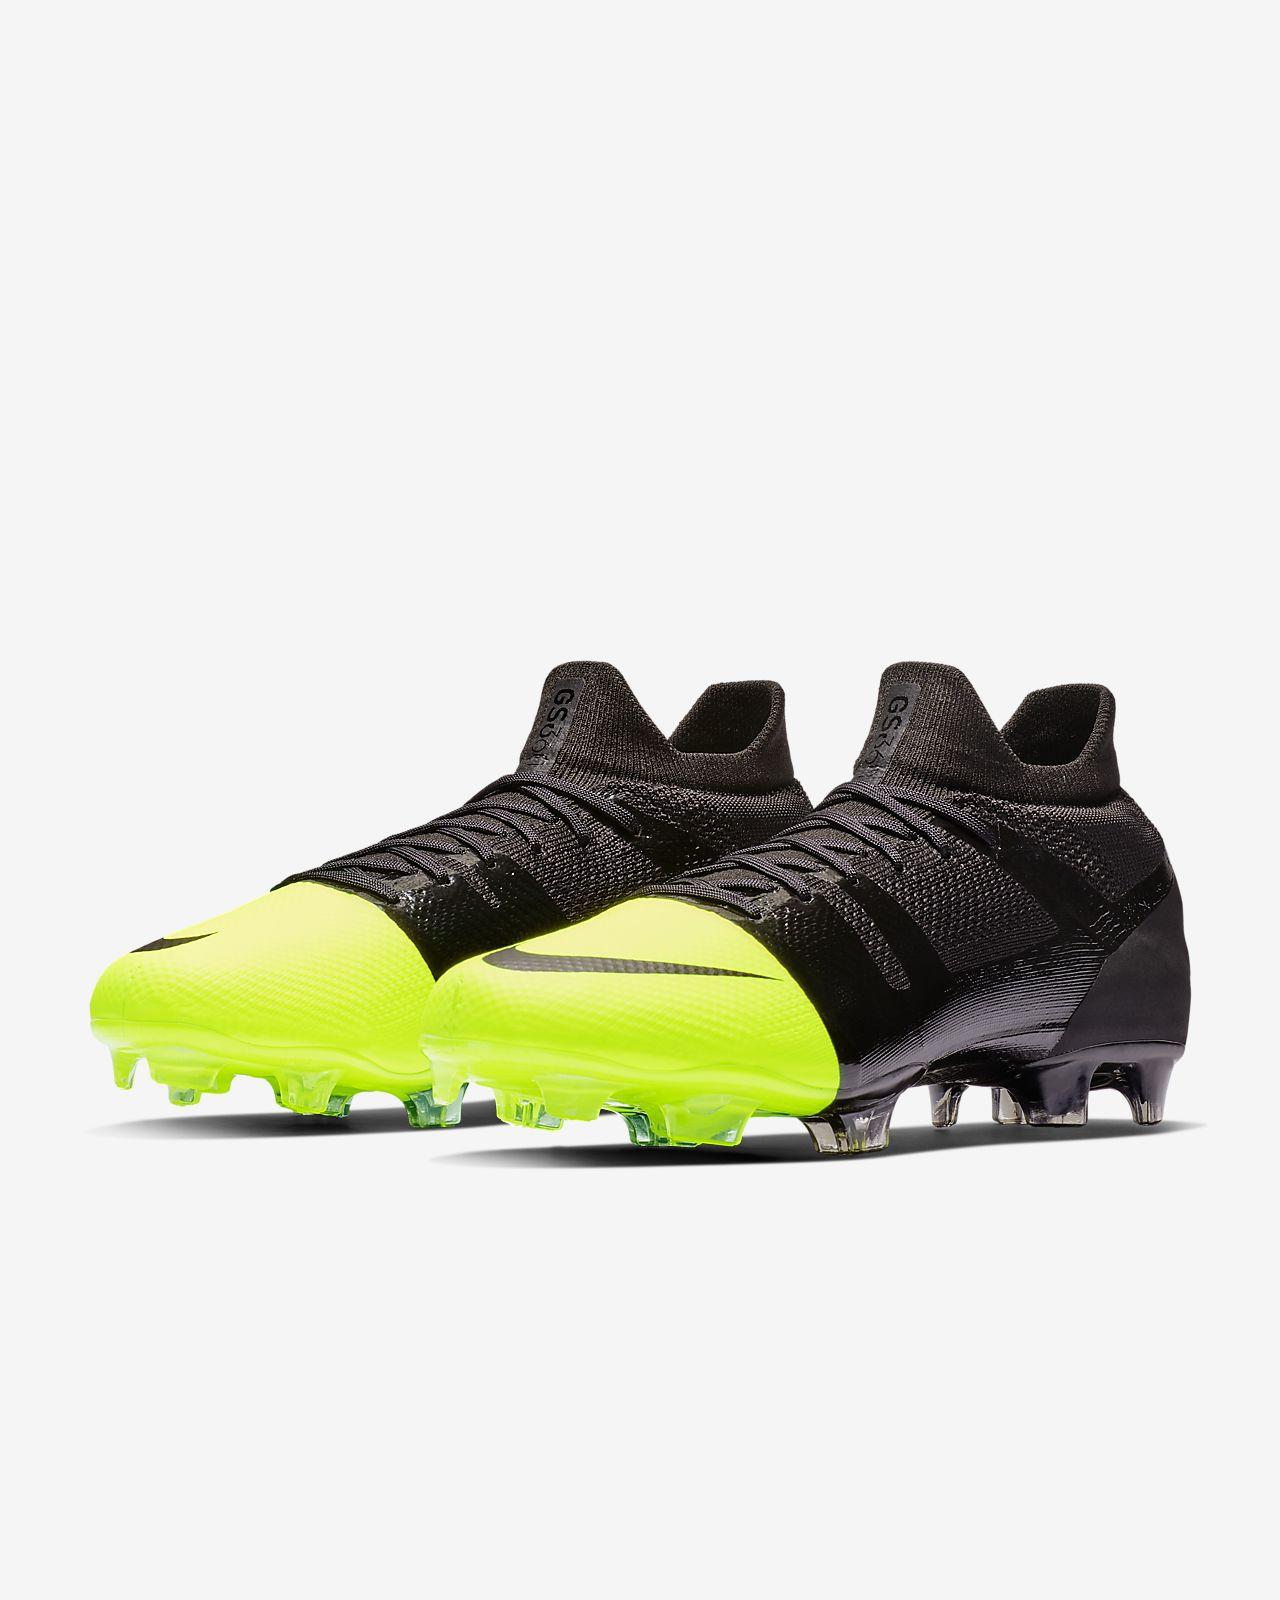 uk availability e3f4b eb062 ... Nike Mercurial GS 360 Firm-Ground Football Boot